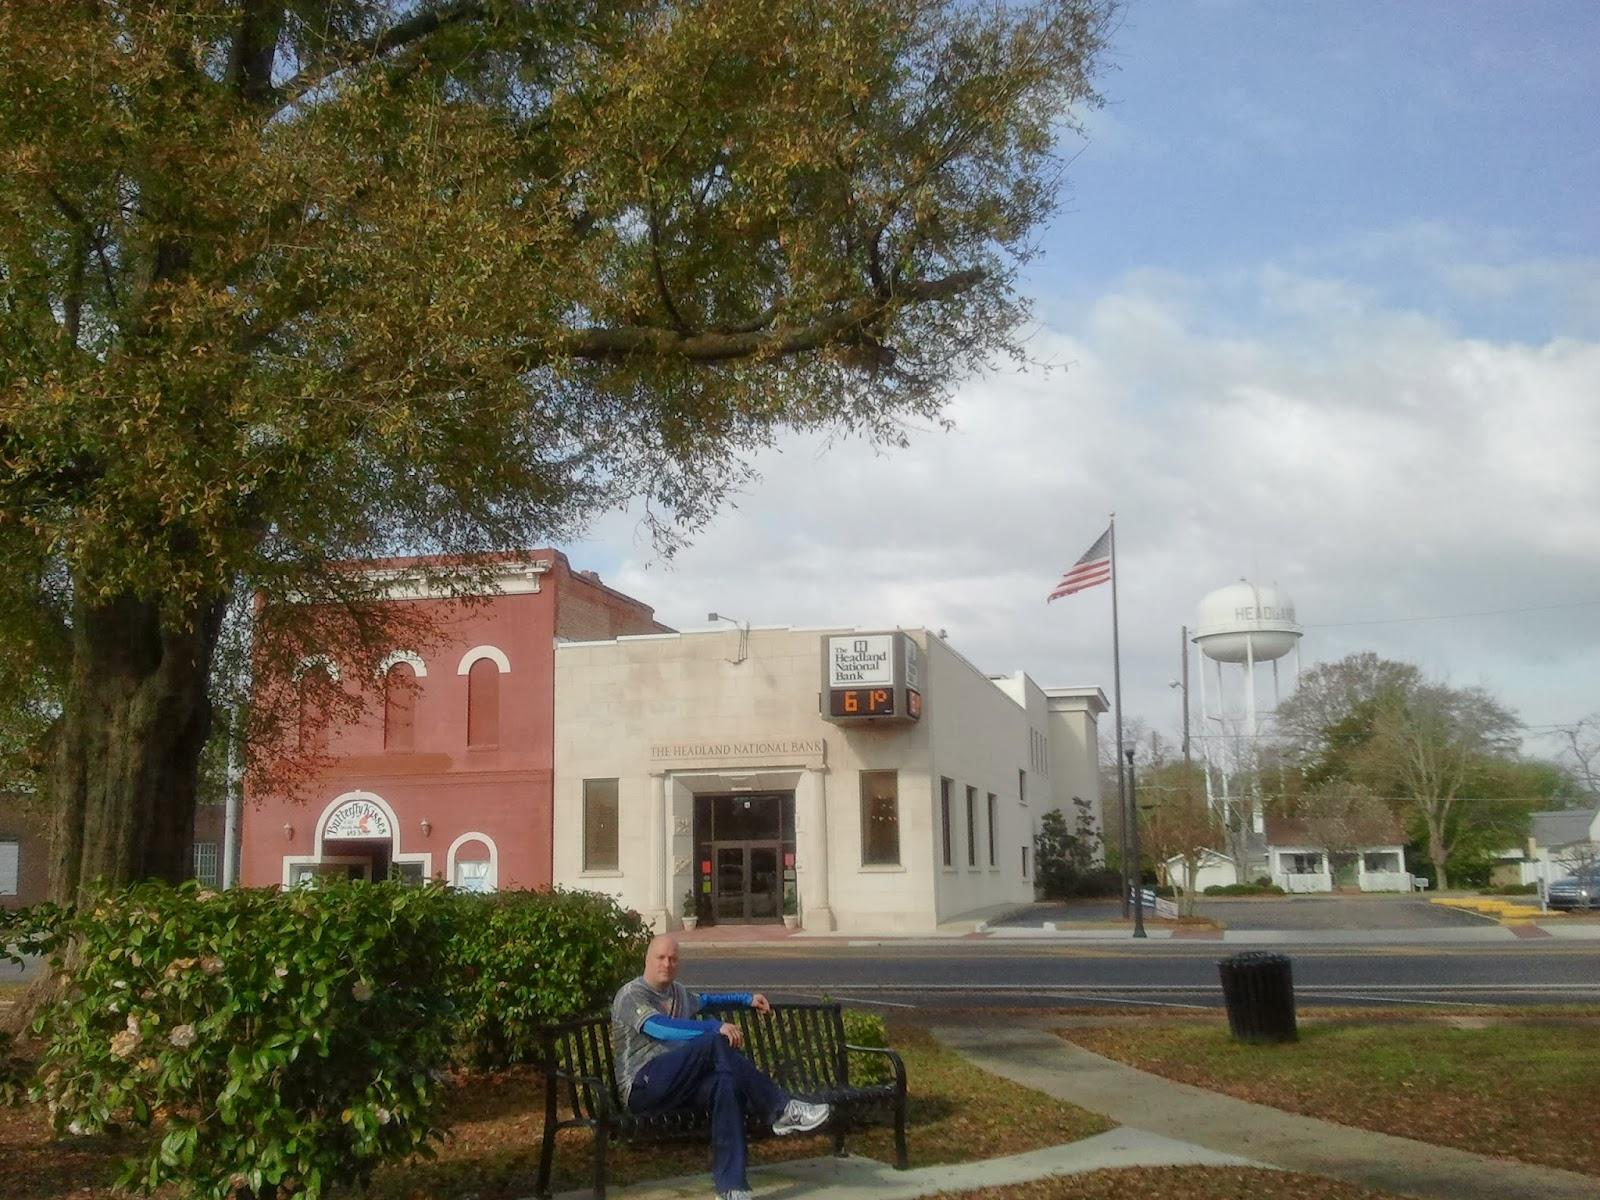 Headland, Alabama Town Square